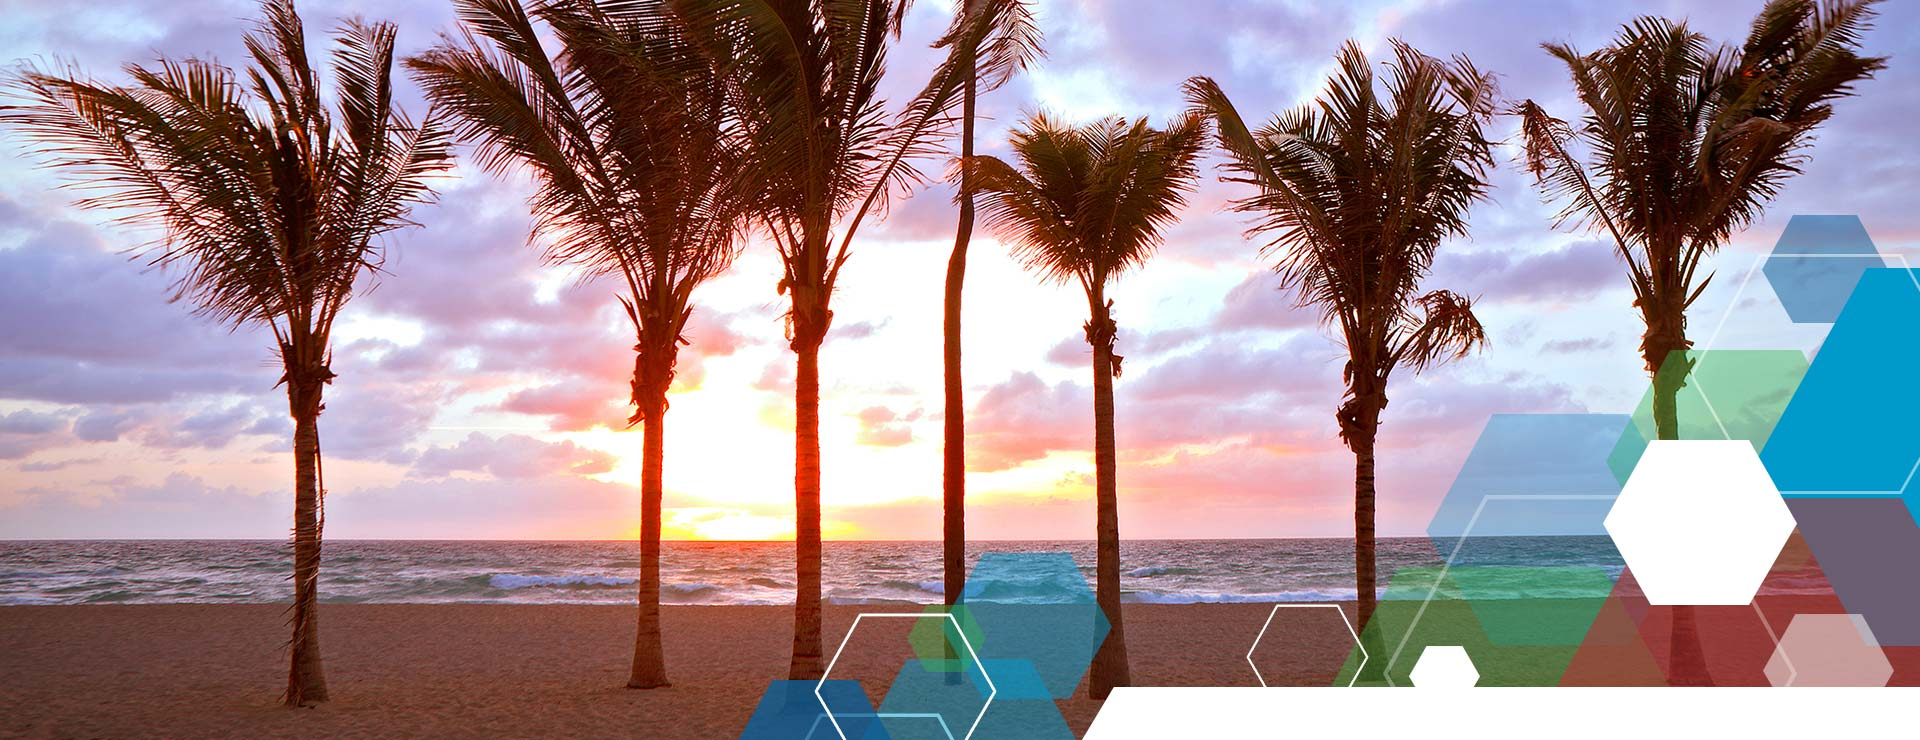 Logisticare Florida Facility Network Downloads